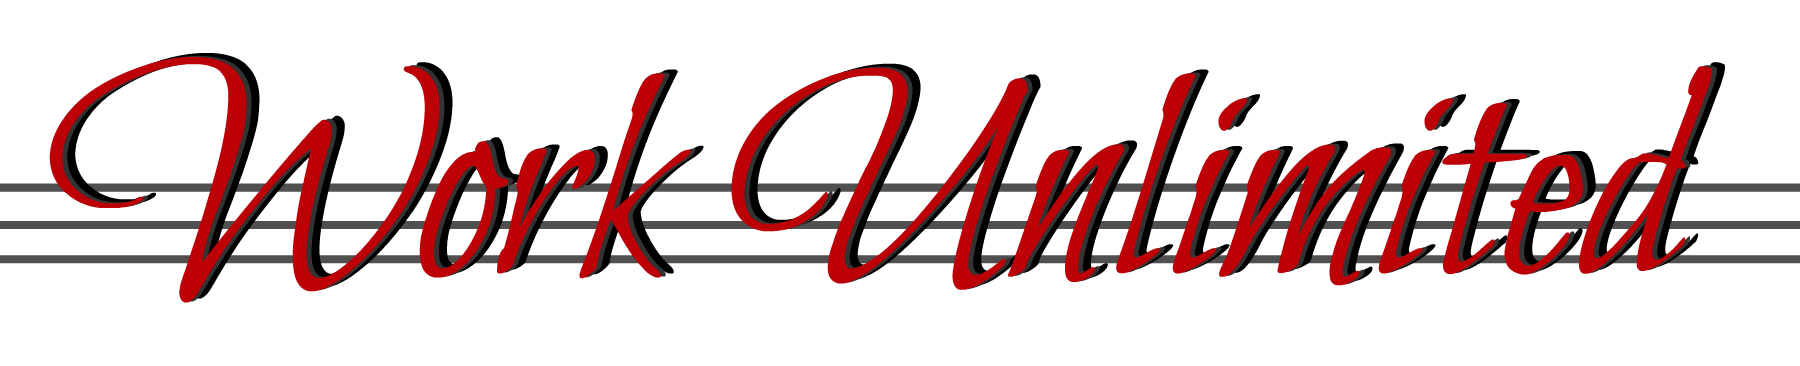 Kitchenaid Logo Transparent work unlimited - support living